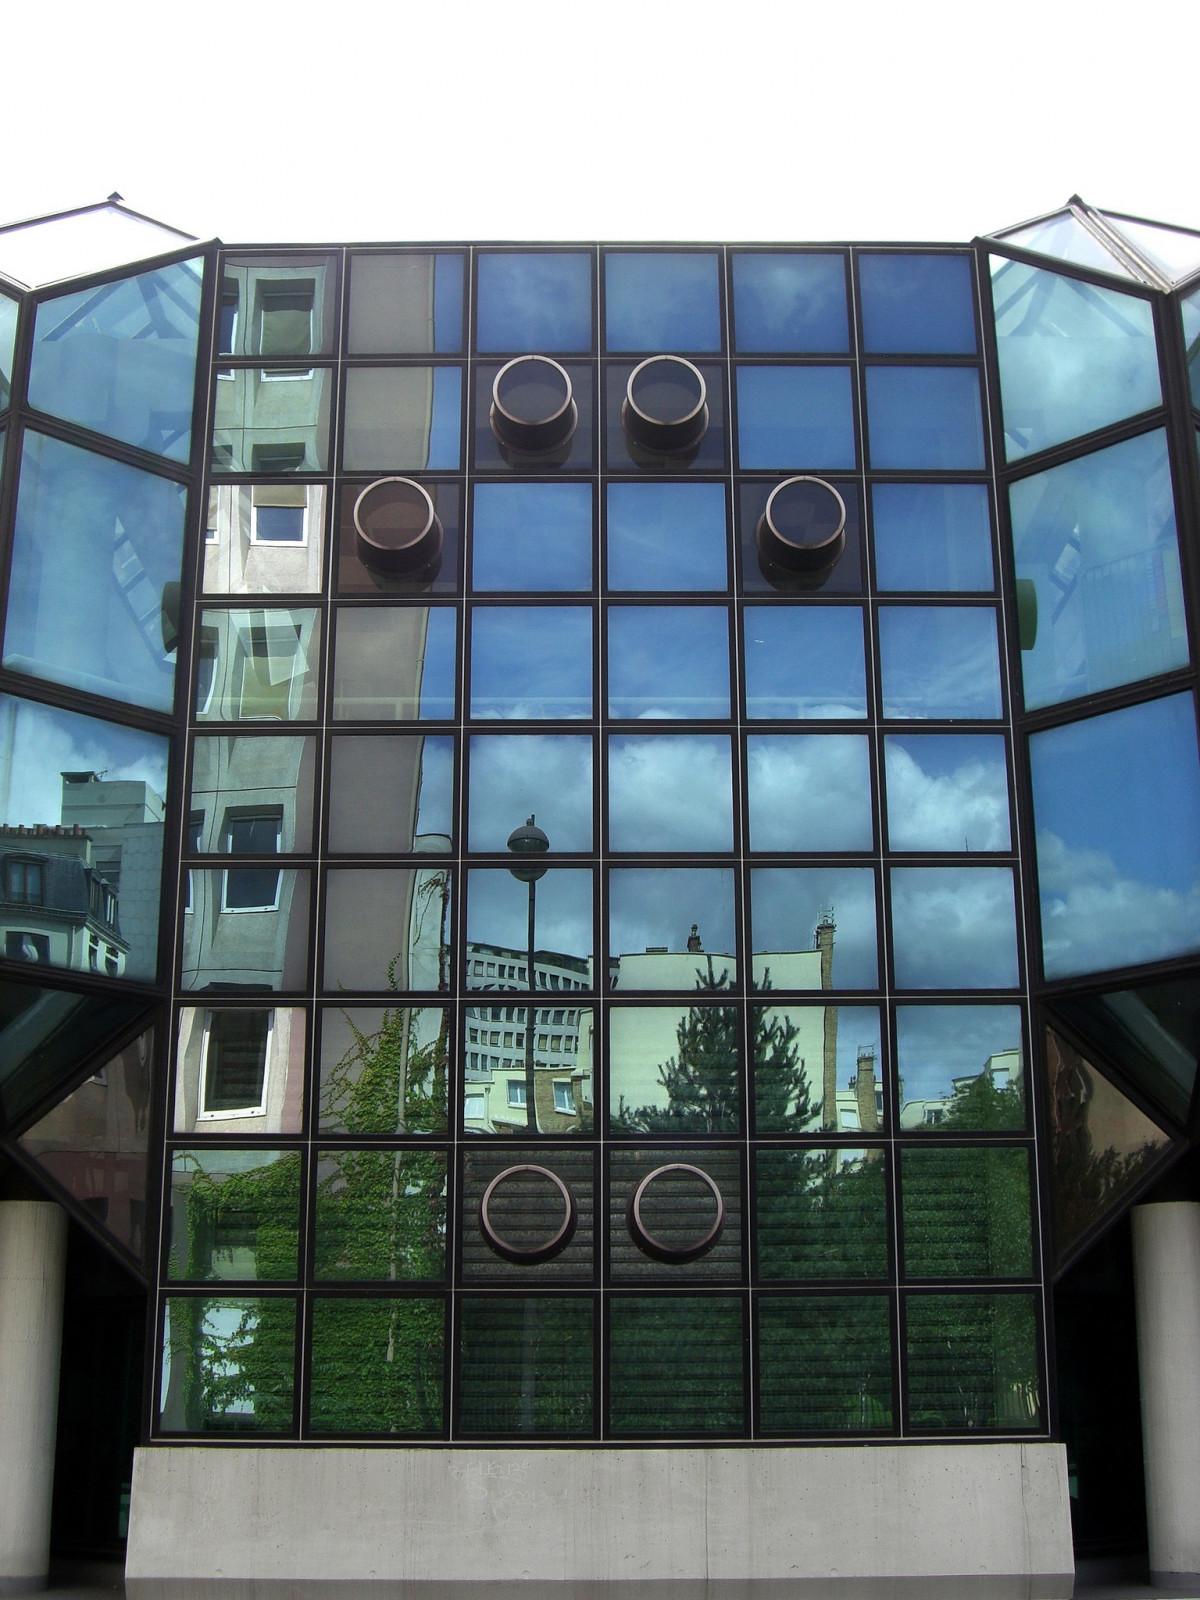 Images Gratuites Architecture Verre La Glace Boutique Le Magasin R Flexion Fa Ade Porte